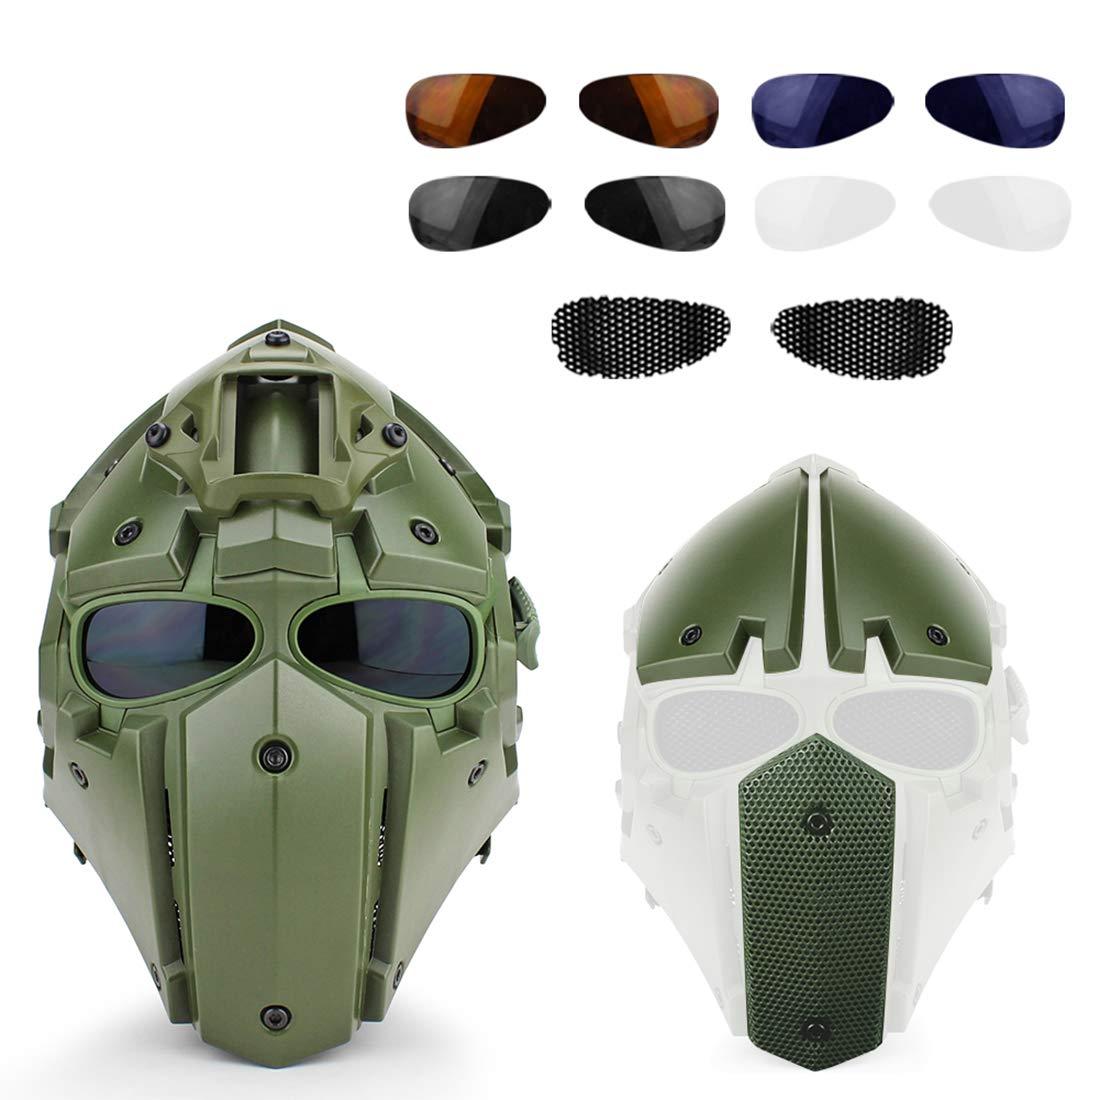 GODNECE Masque Combat Masque Tir Casque Tactique Militaire Casque Int/égral Airsoft pour Airsoft Paintball Wargame CS